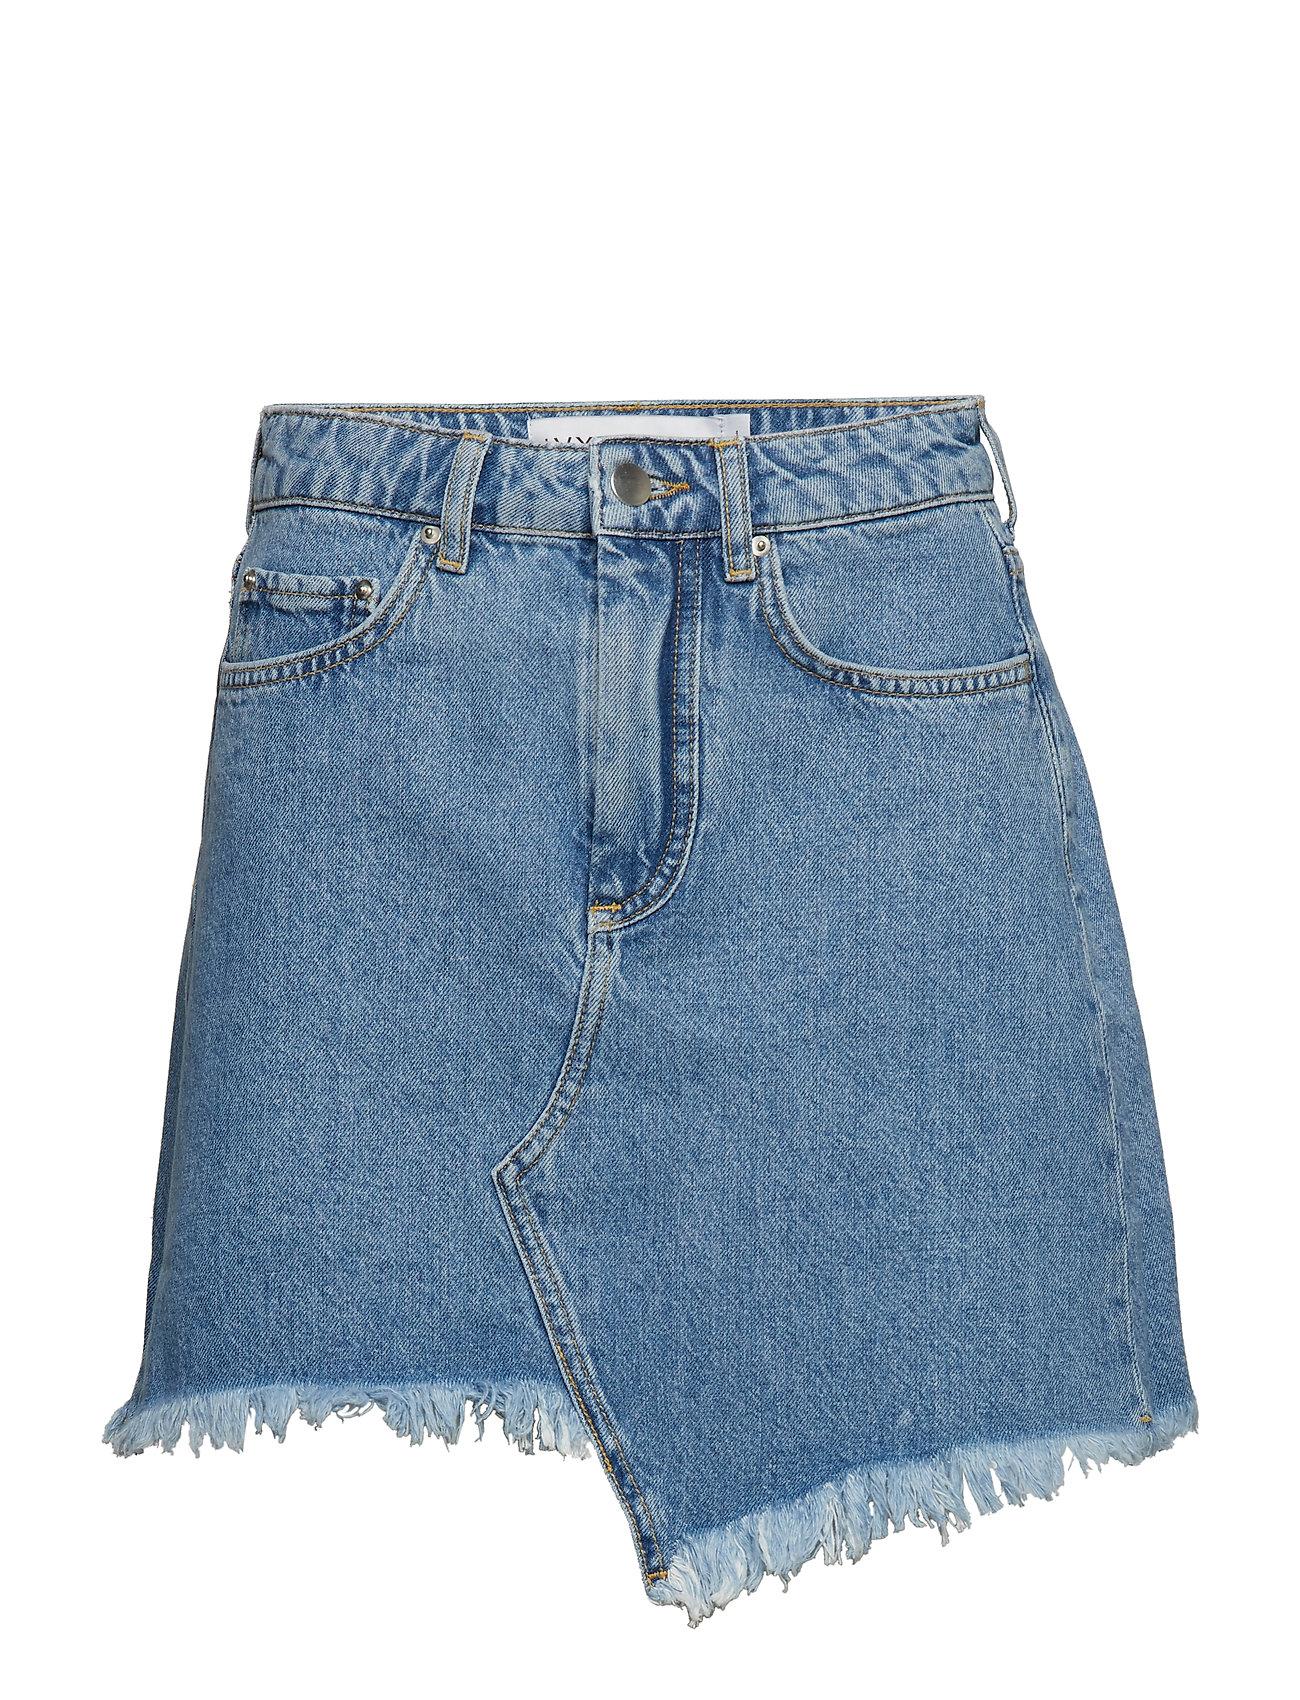 Ivyrevel Raw Edge Denim Skirt - BLUE